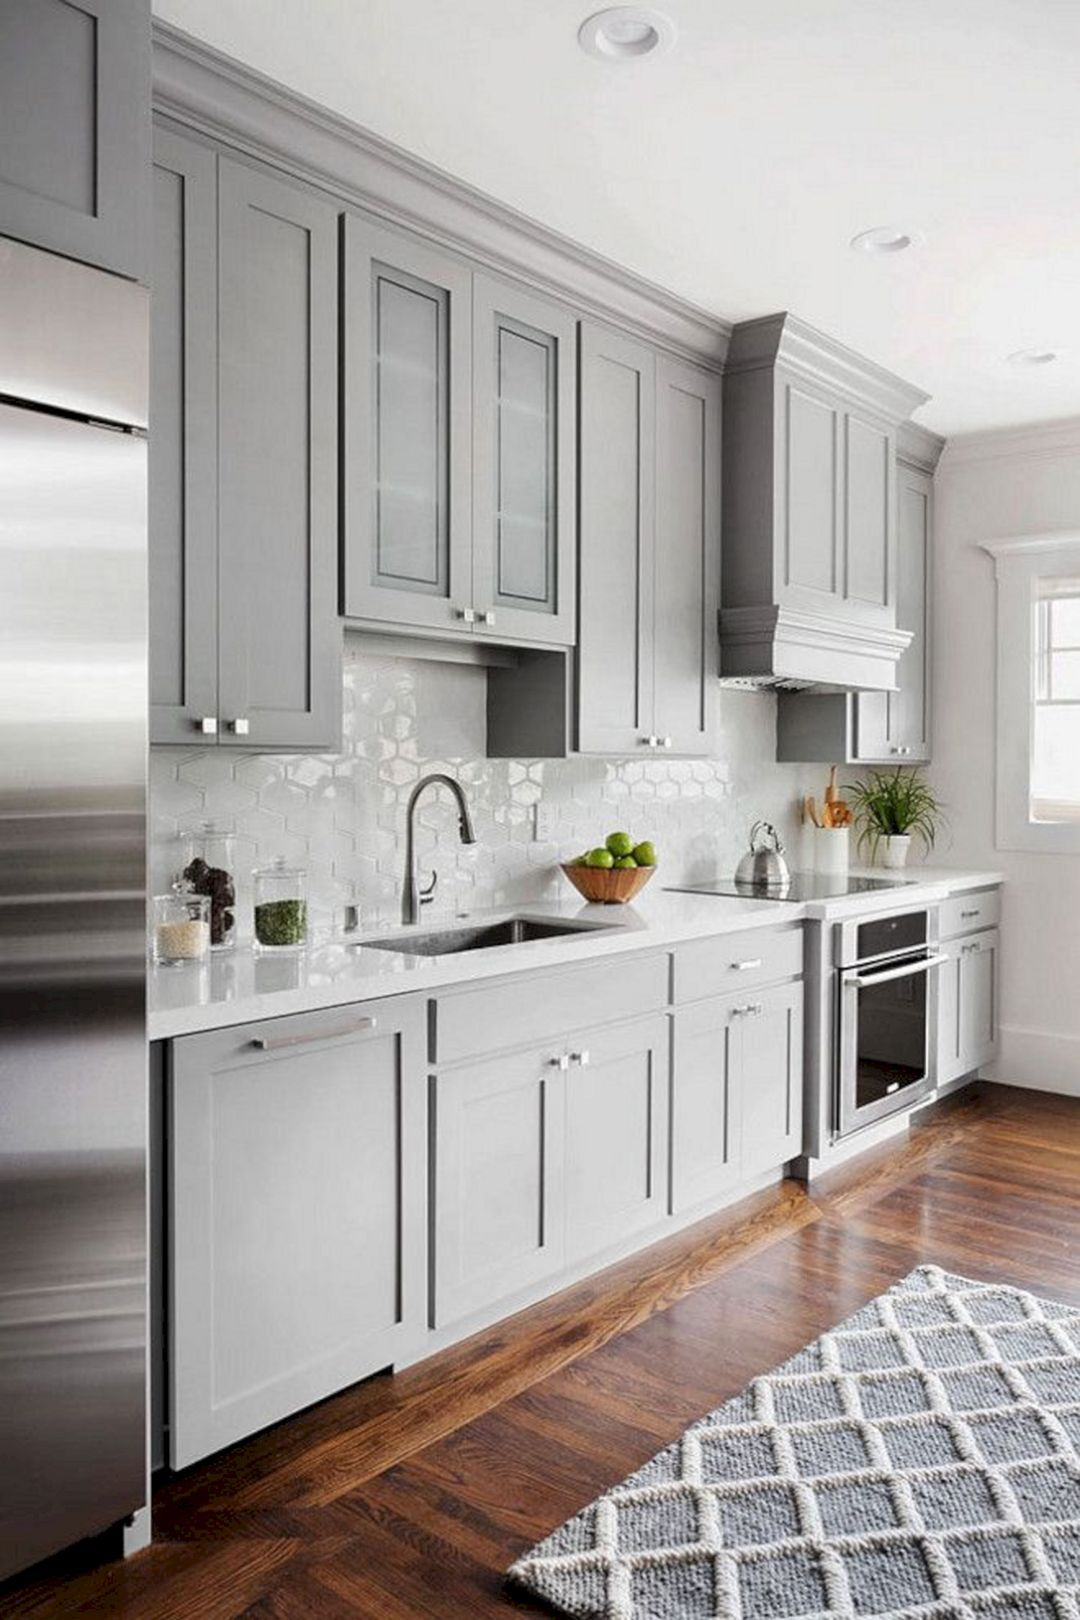 Top Best Kitchen Decor Collection Ideas: Modern, Farmhouse, Rustic ...